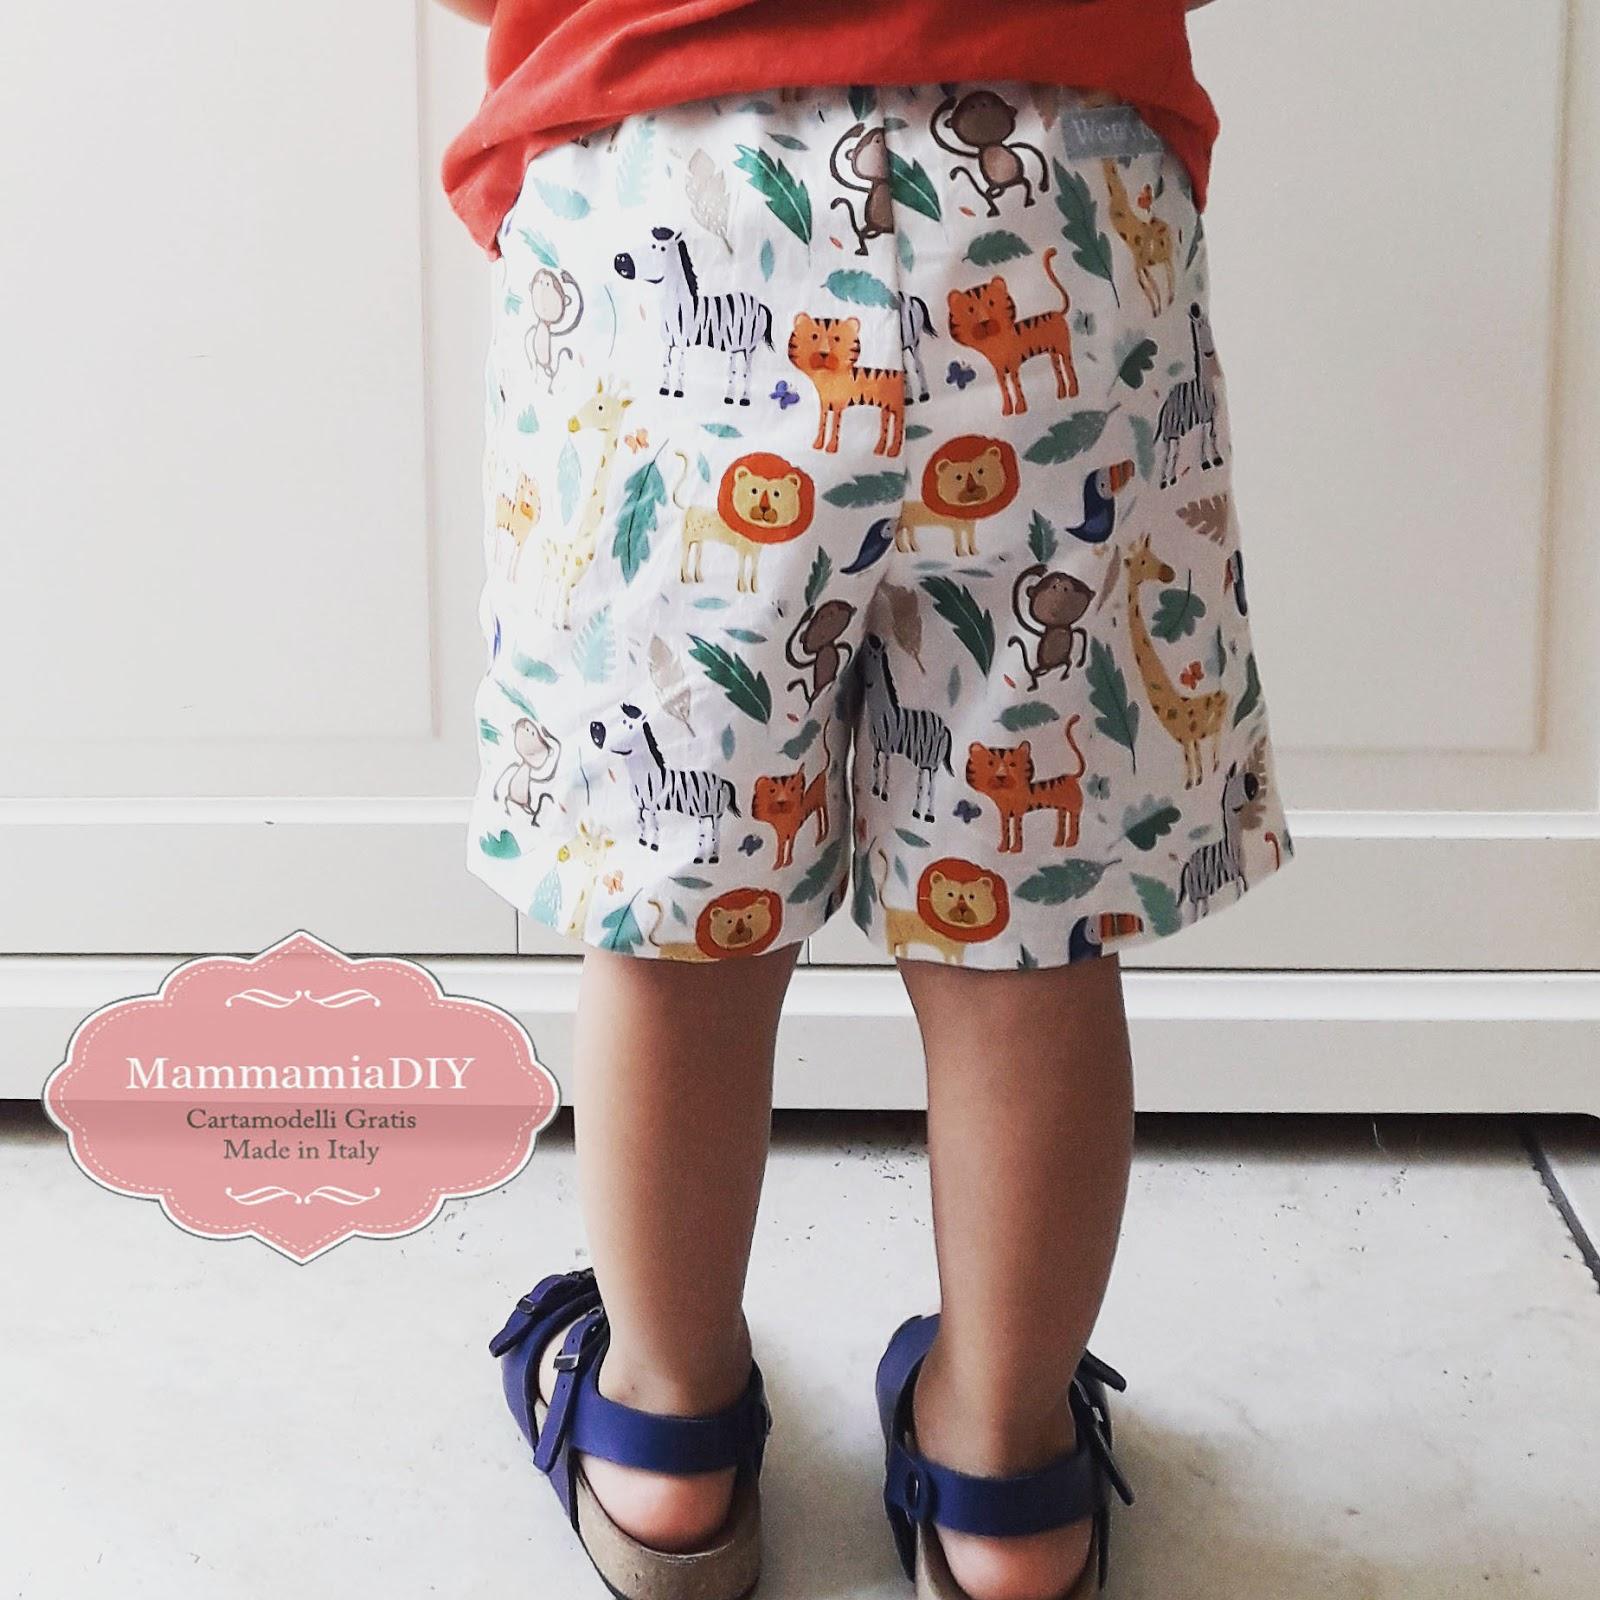 online store 17b5e 9d9c7 MammamiaDIY Cartamodelli/Patrones gratis: DIY Cartamodelli ...